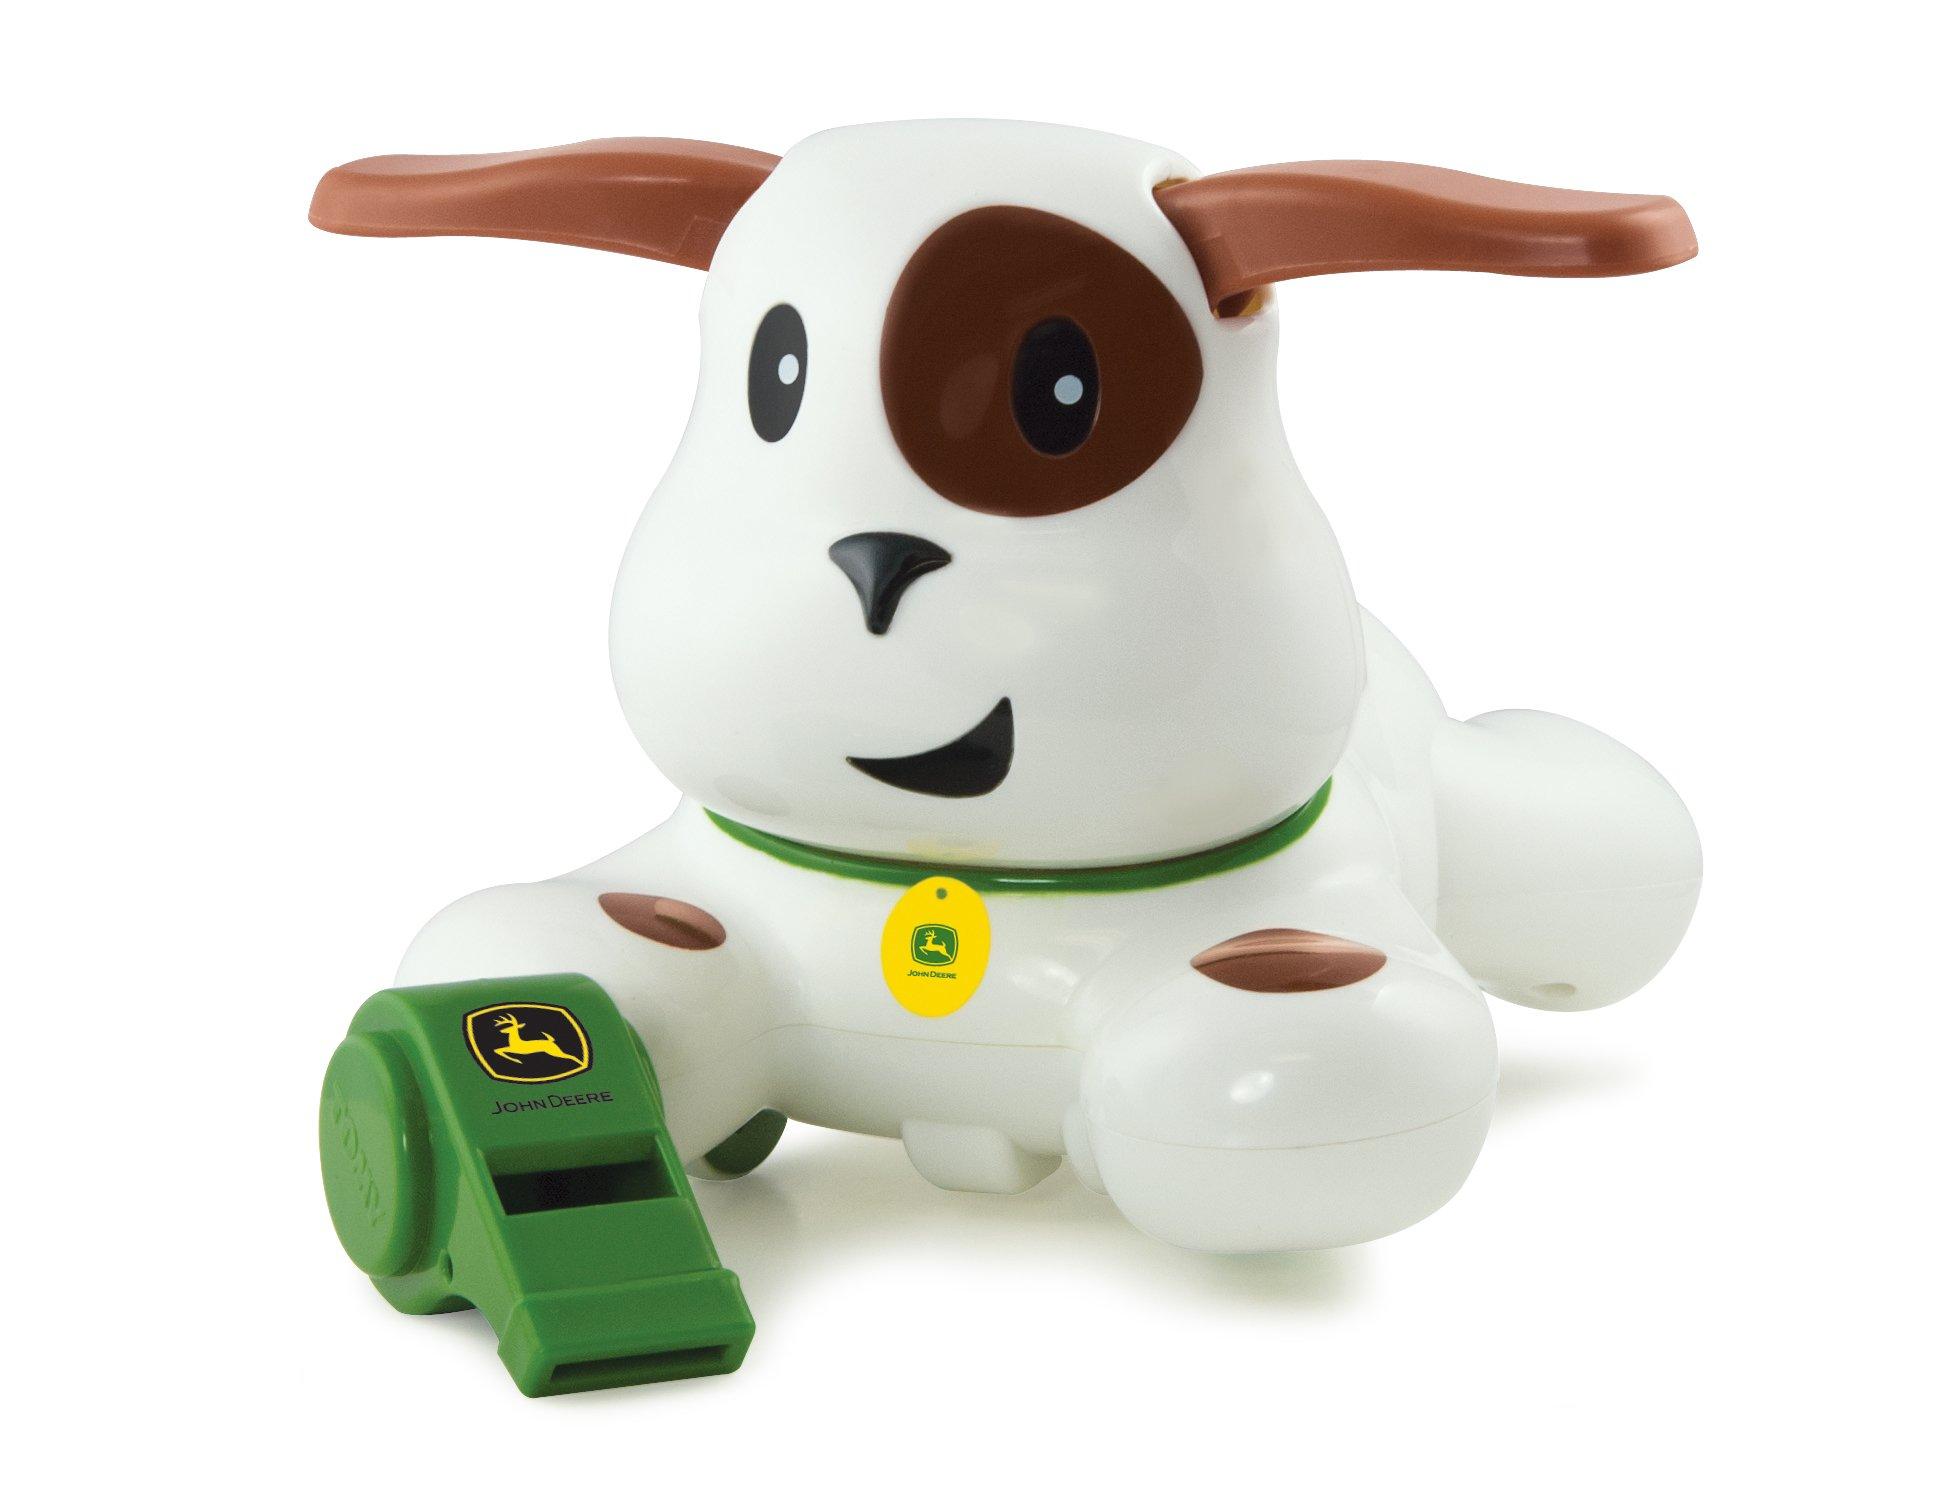 Ertl John Deere Whistle and Go Puppy